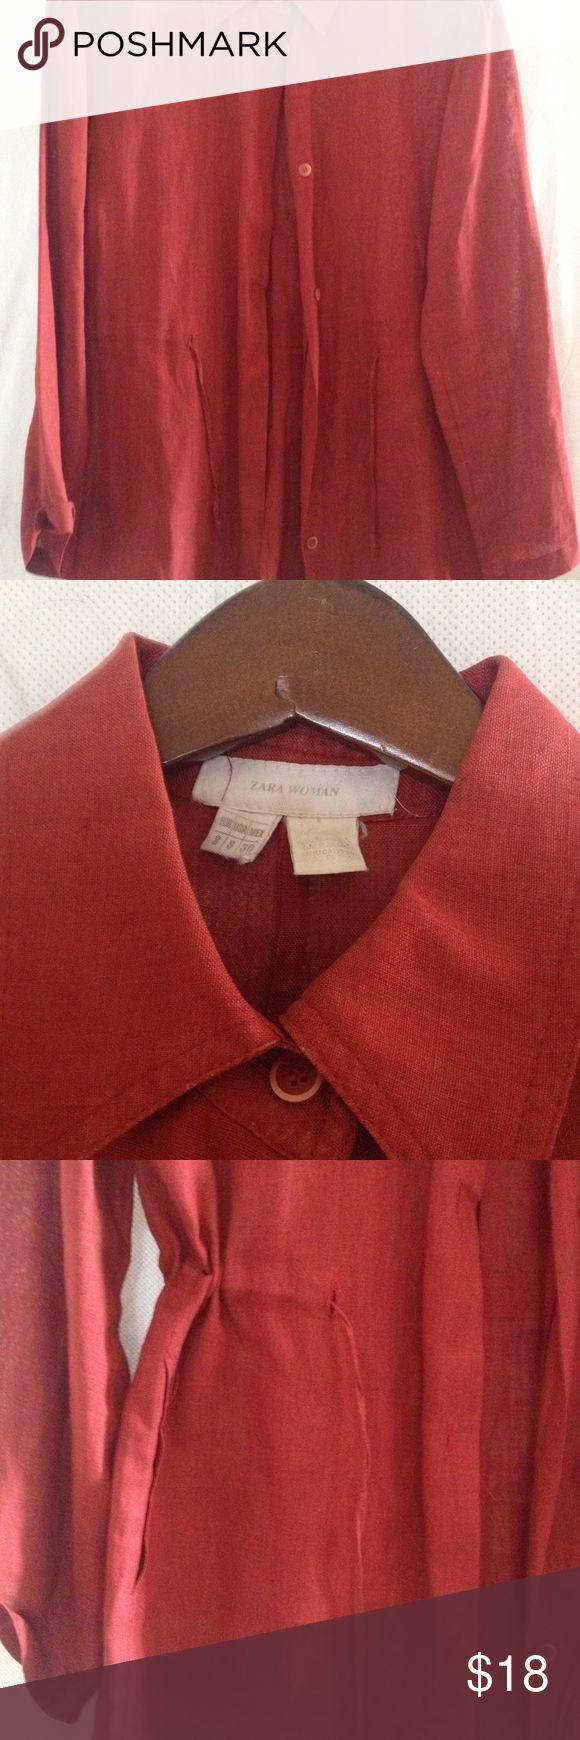 Zara woman linen red jacket with drawstring waist Zara woman linen red jacket with drawstring waist size small Zara Jackets & Coats Blazers